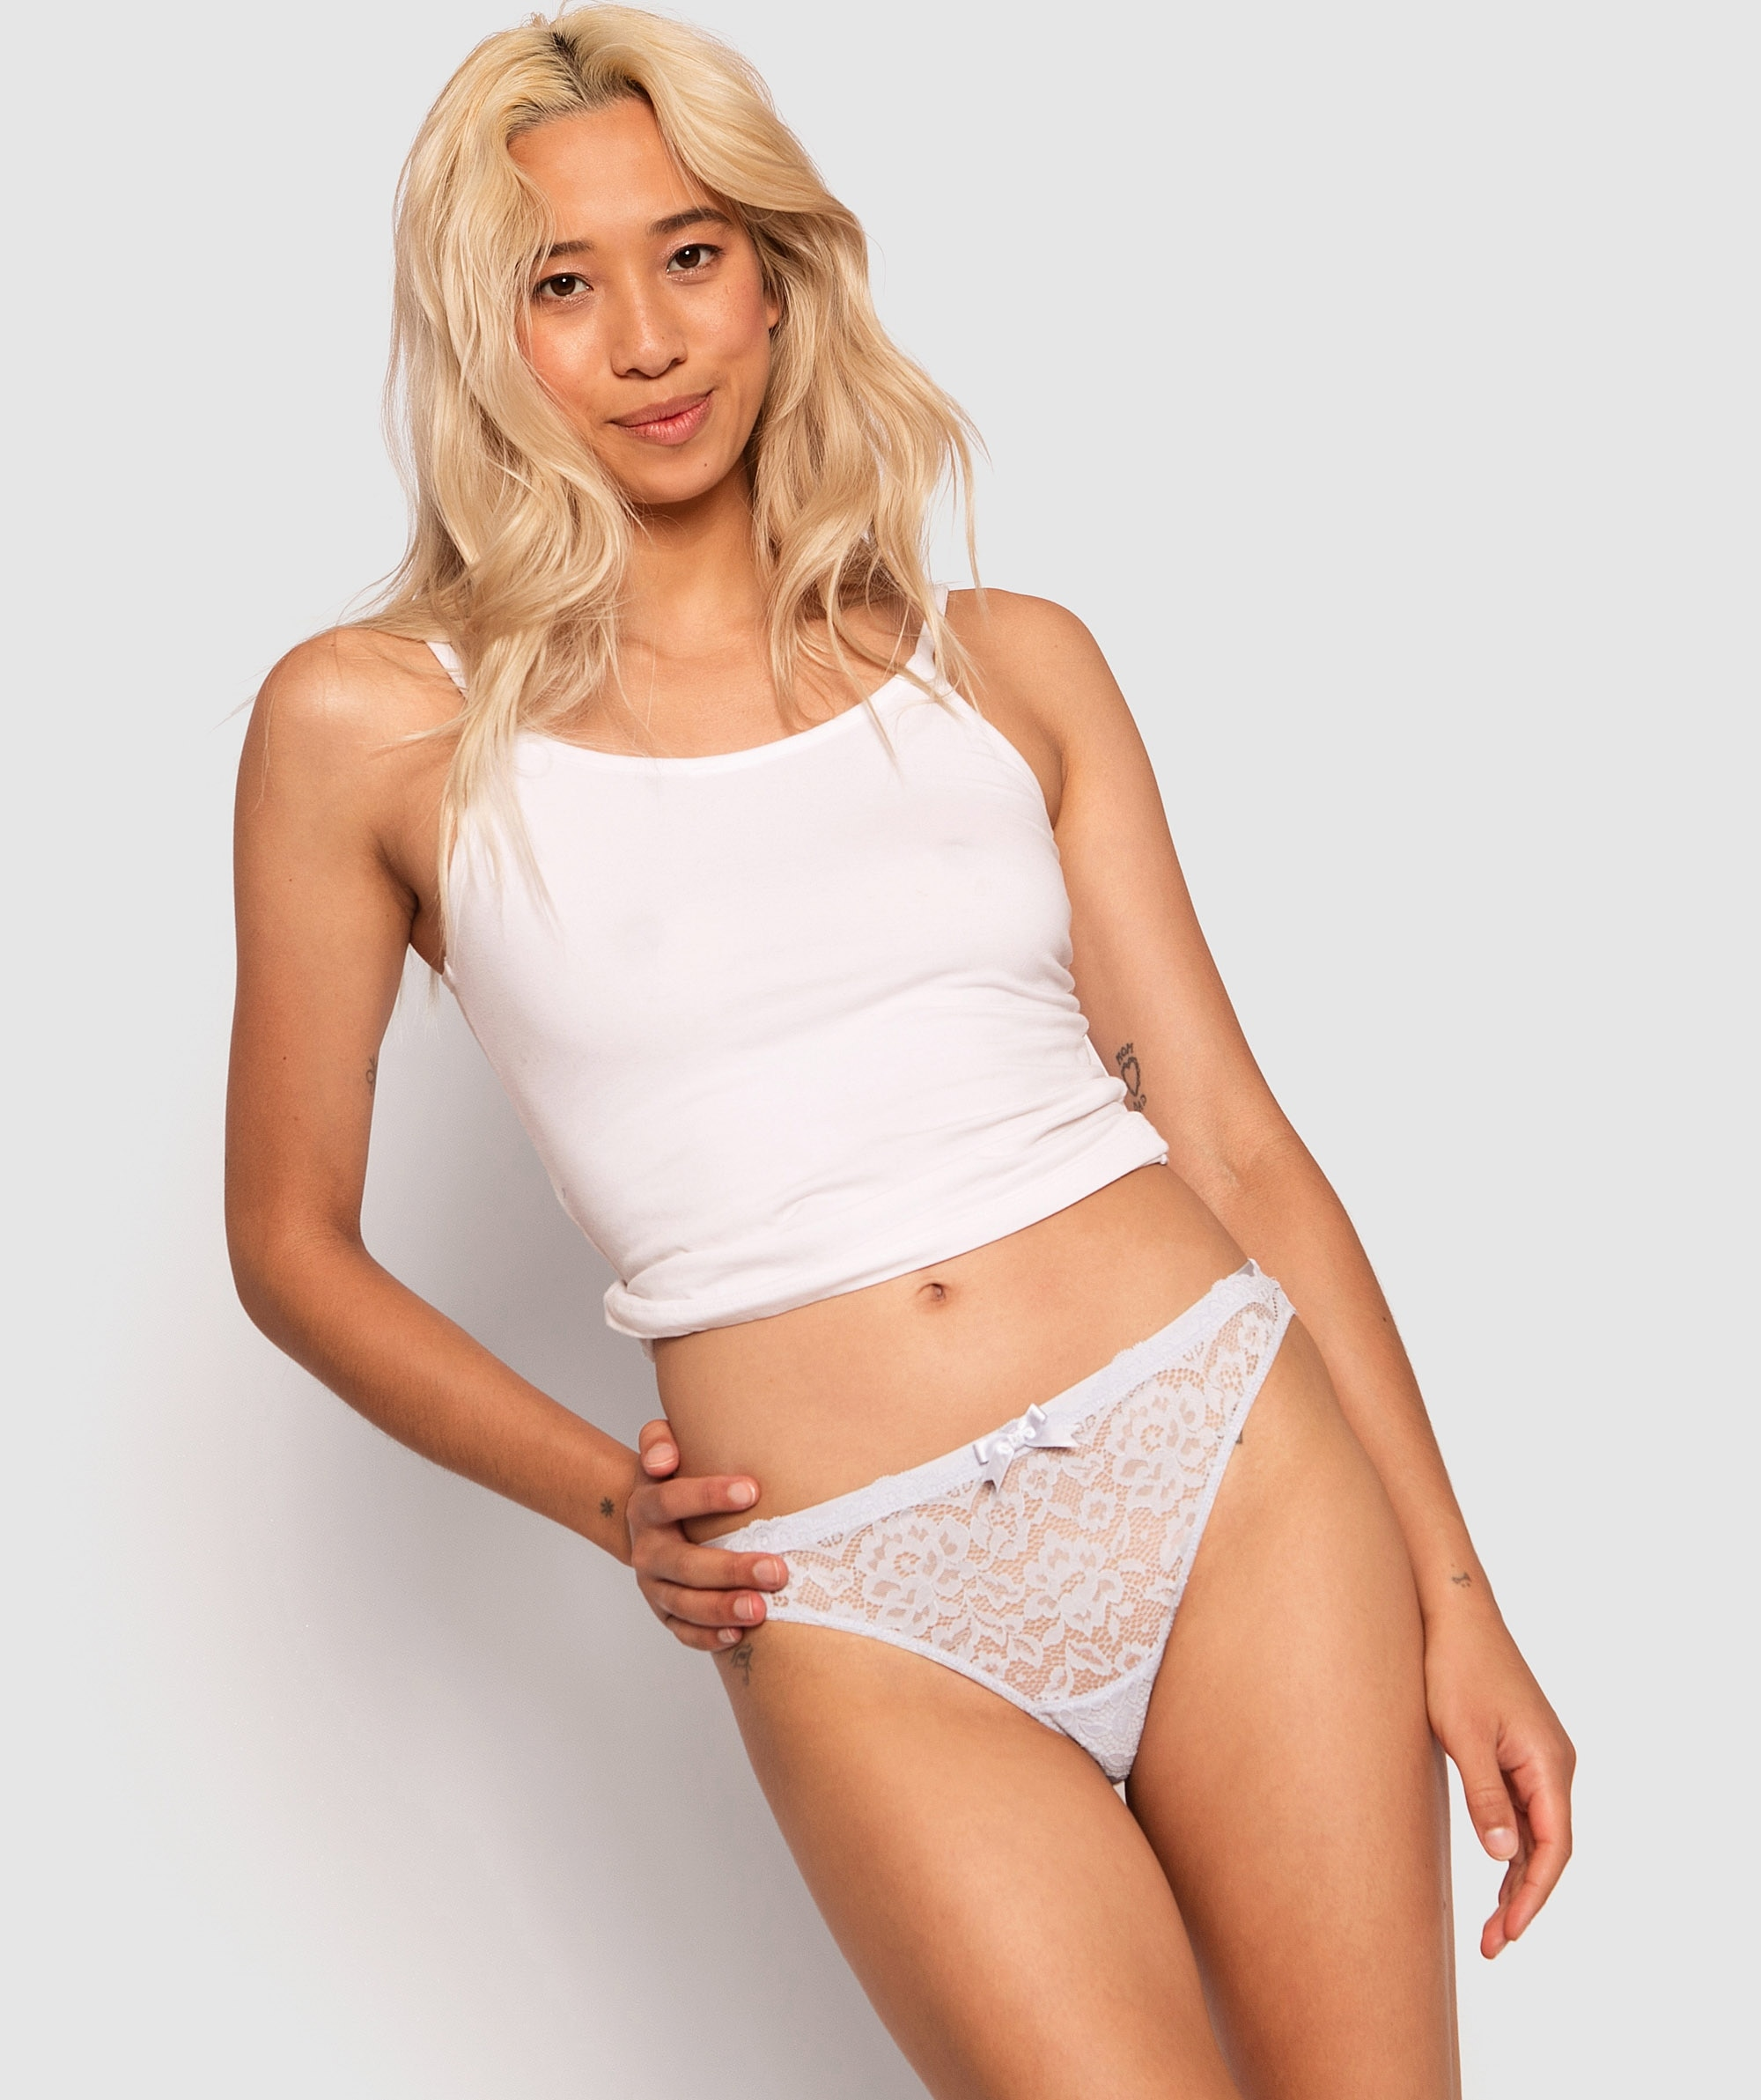 Lilah V-String Knicker - Lilac/Ivory